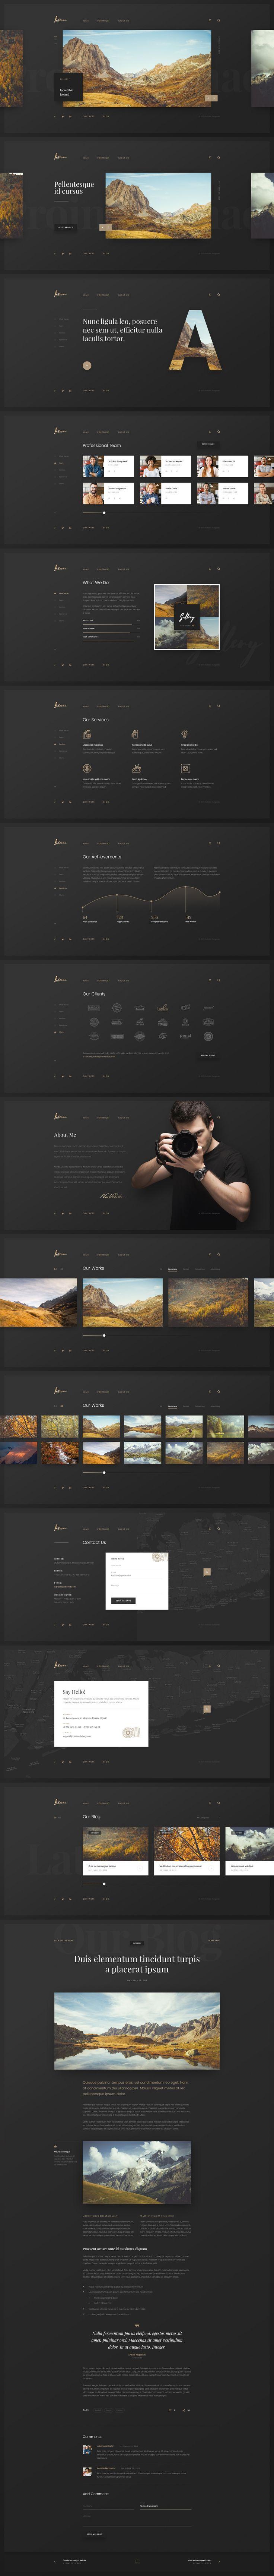 6459 best 9 - Web / UI / UX images on Pinterest | Website